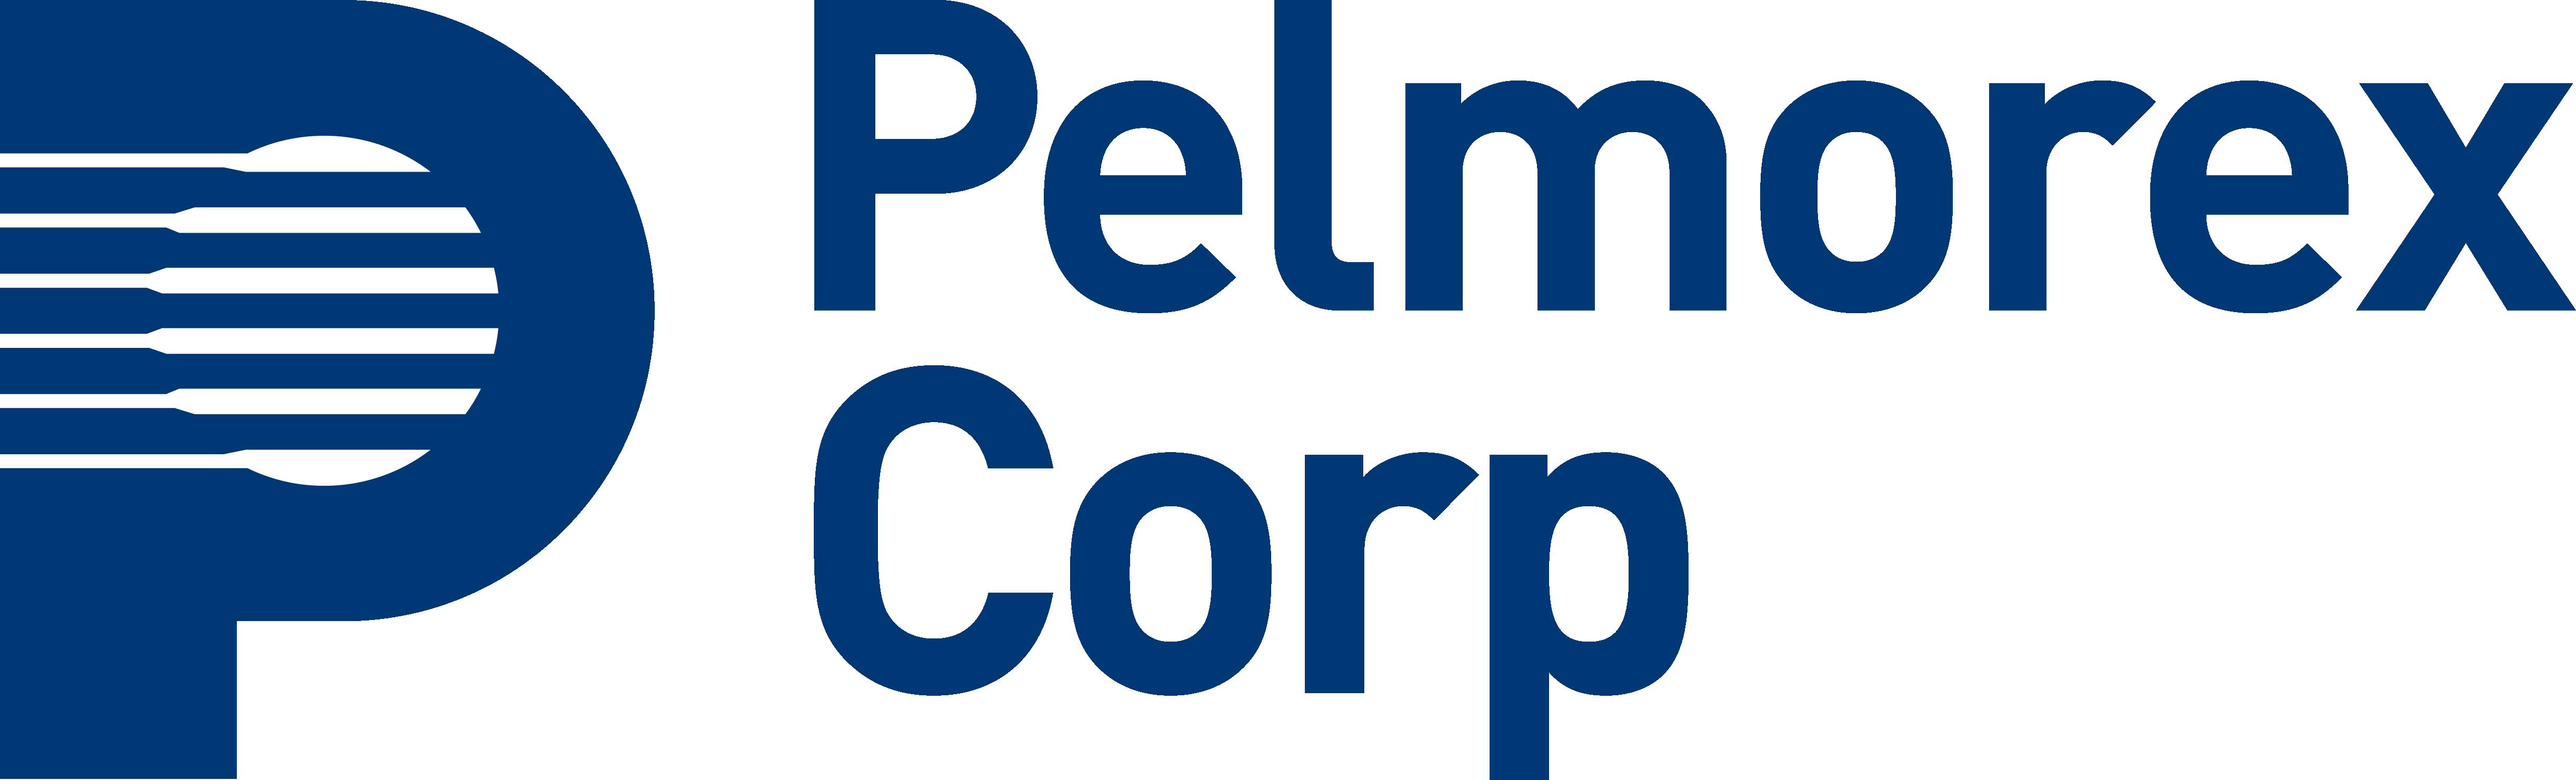 Pelmorex